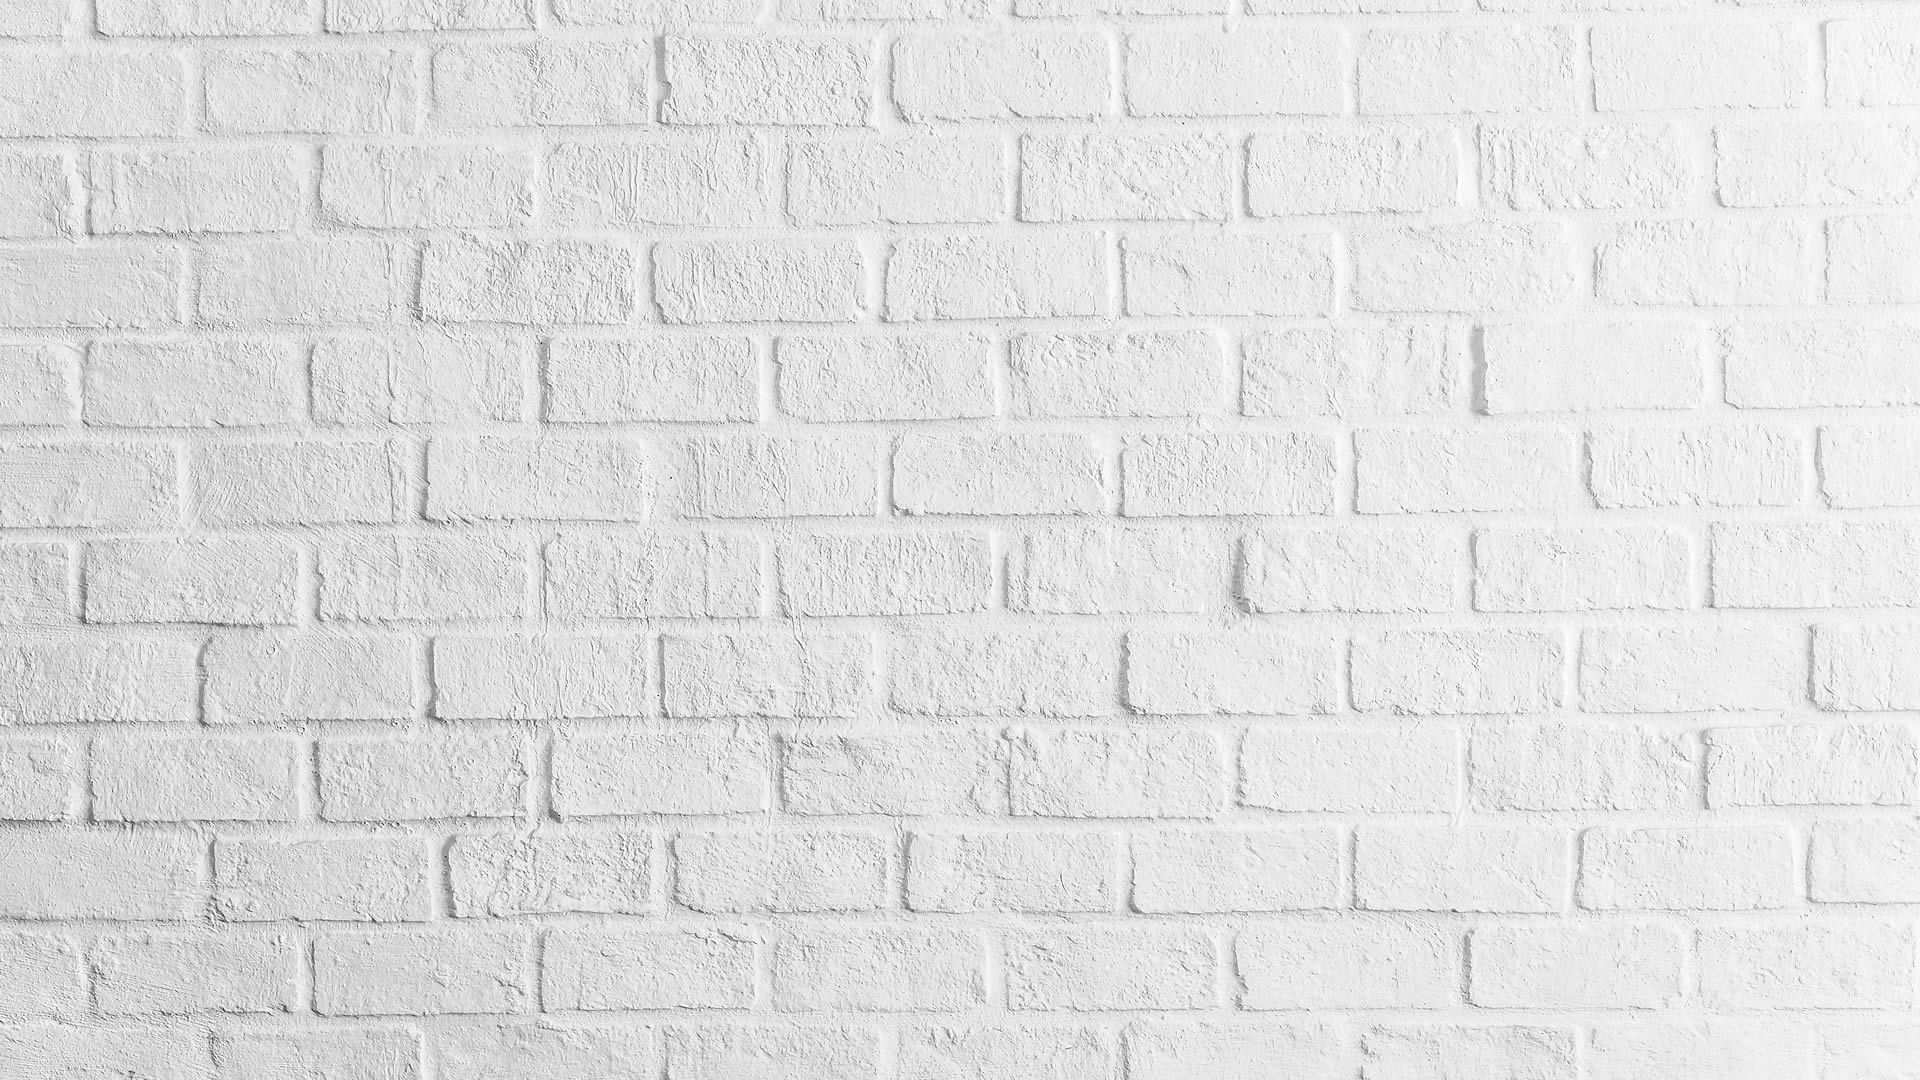 Wall full hd image